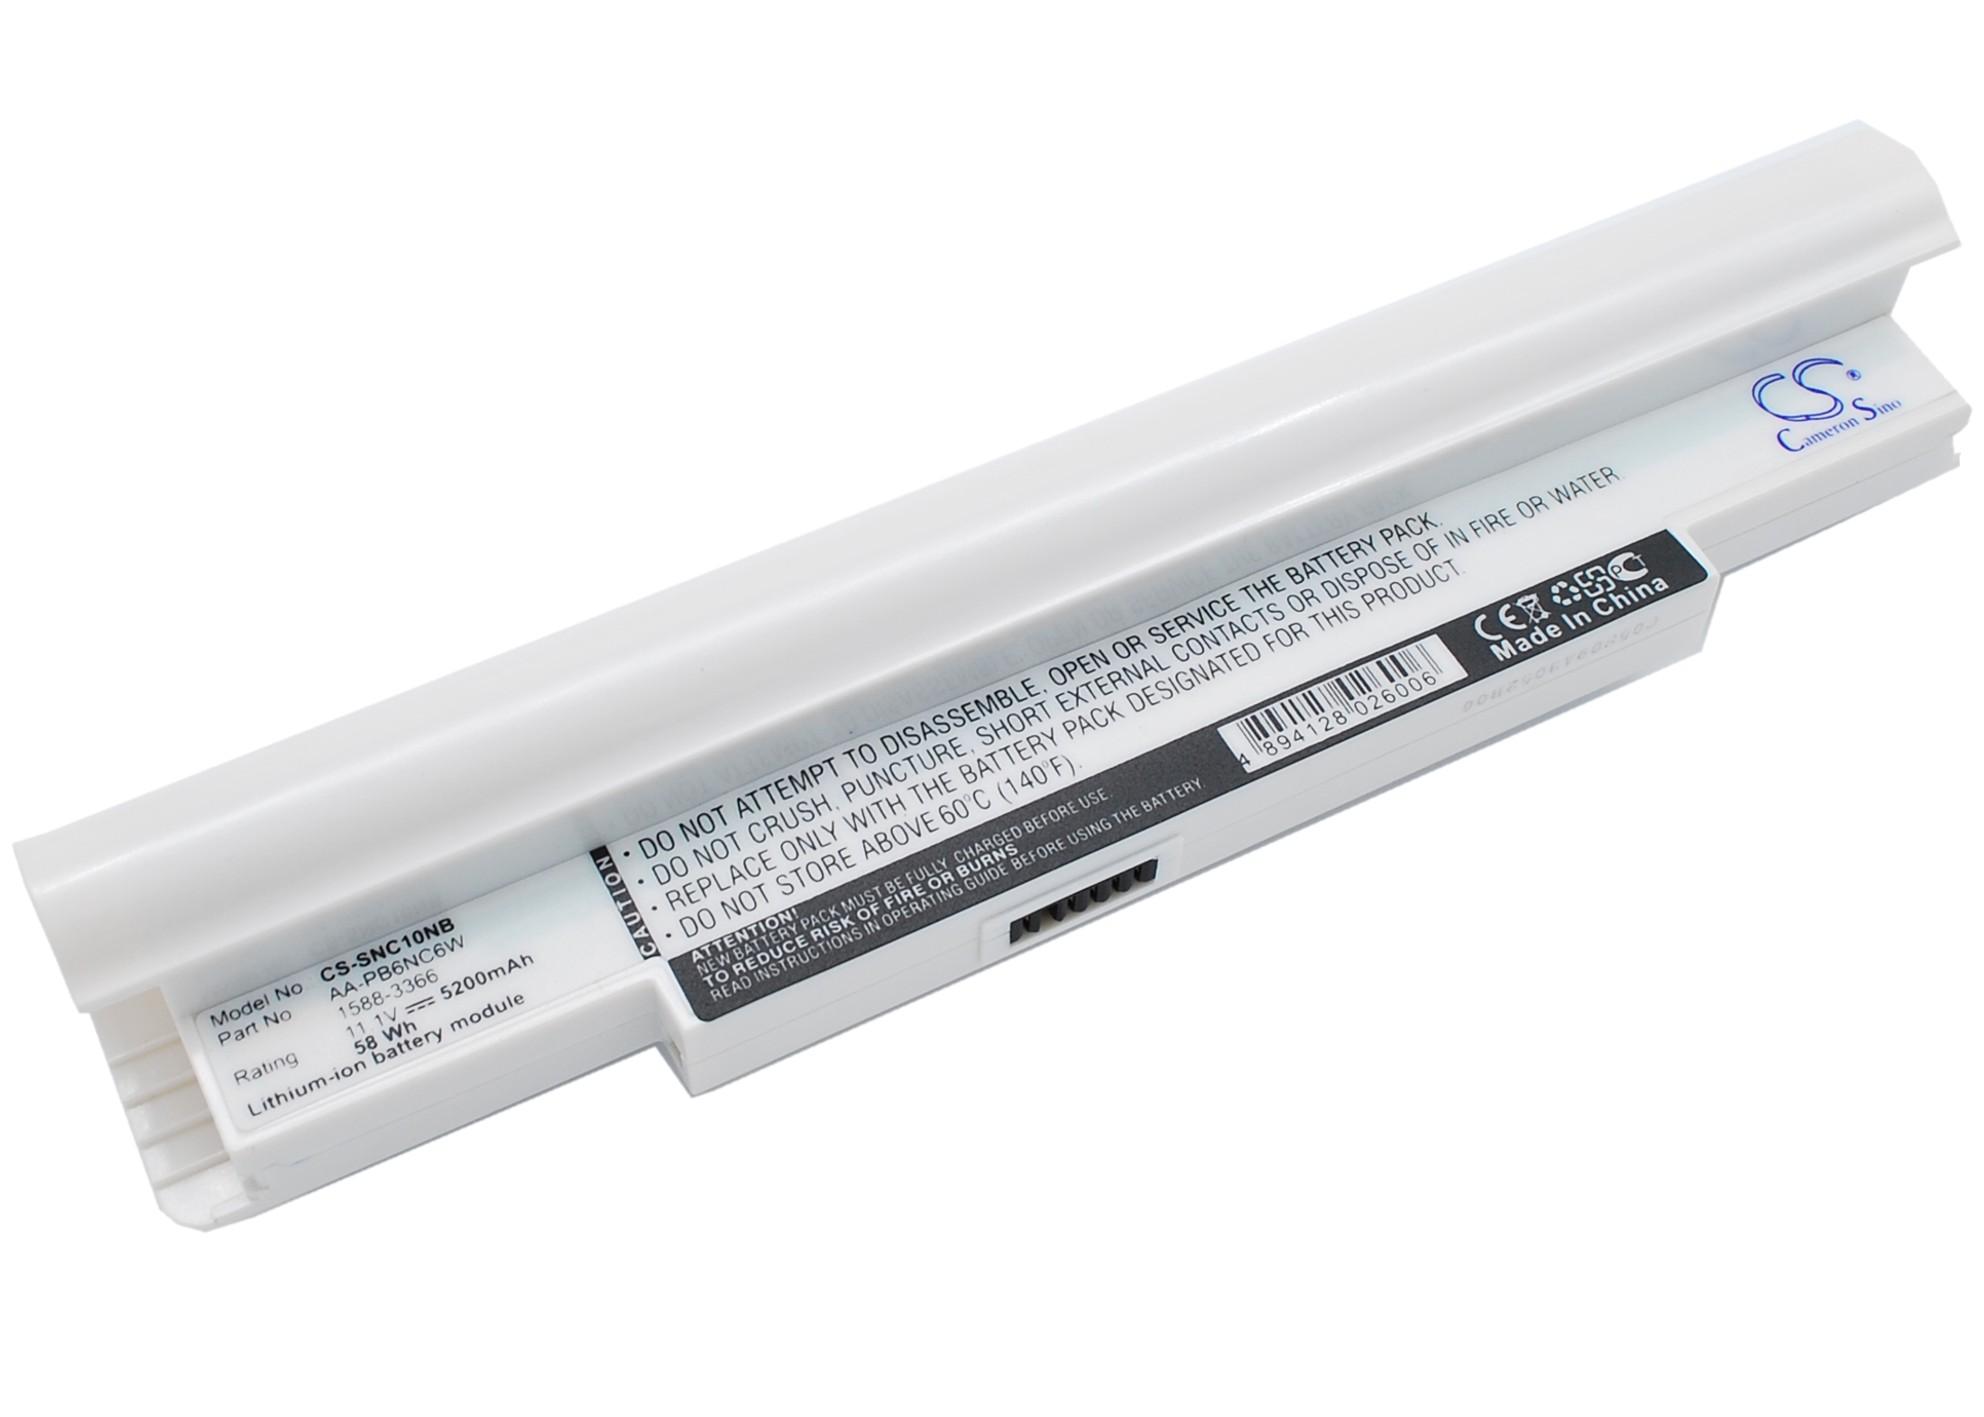 Cameron Sino baterie do notebooků pro SAMSUNG NP-N110-12PBK 11.1V Li-ion 5200mAh bílá - neoriginální